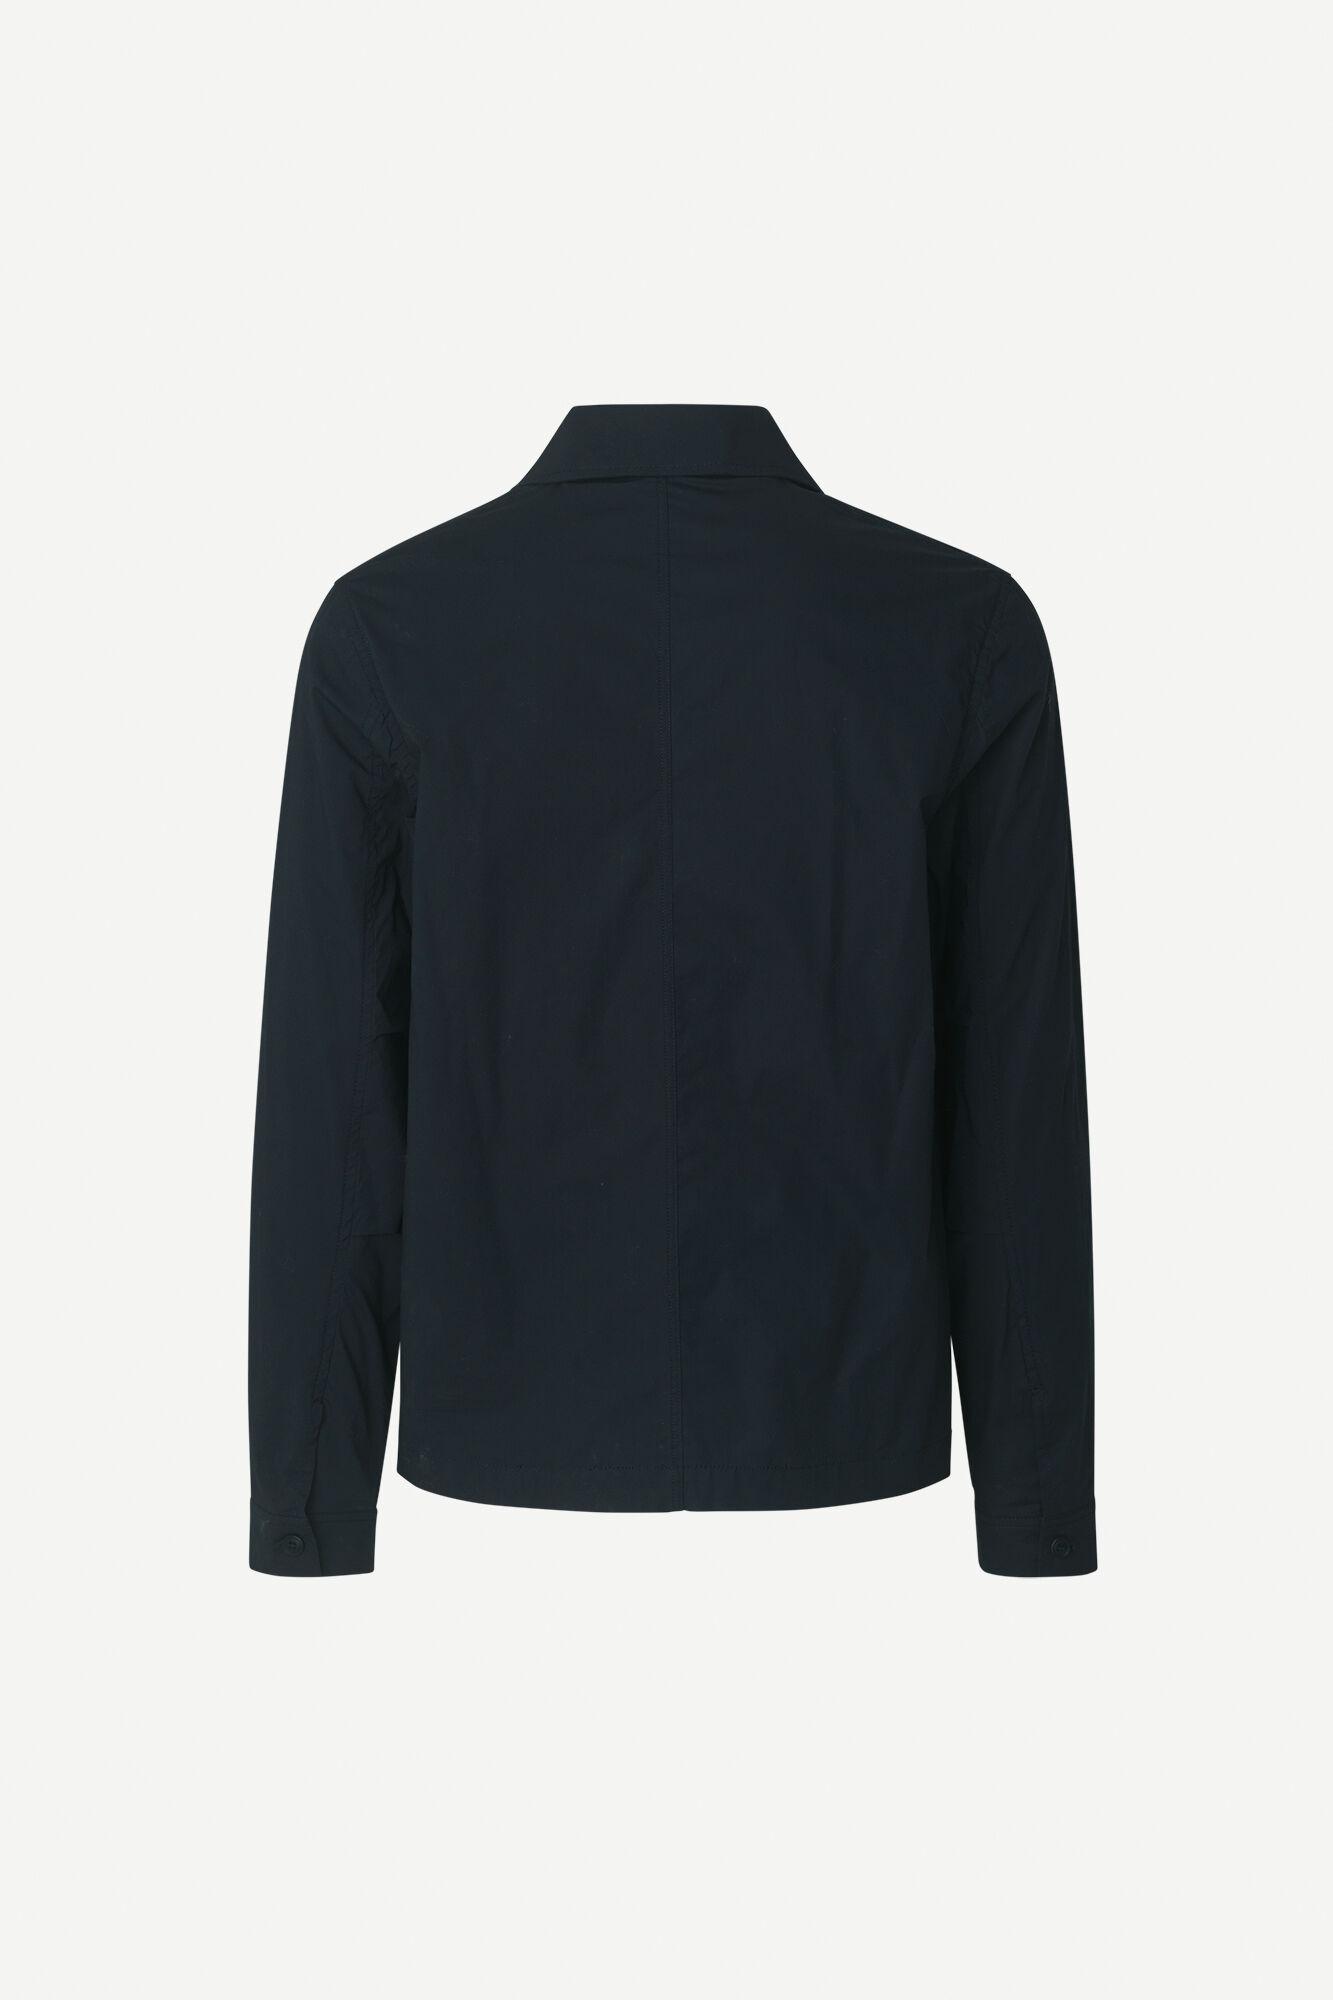 New worker jacket 11044